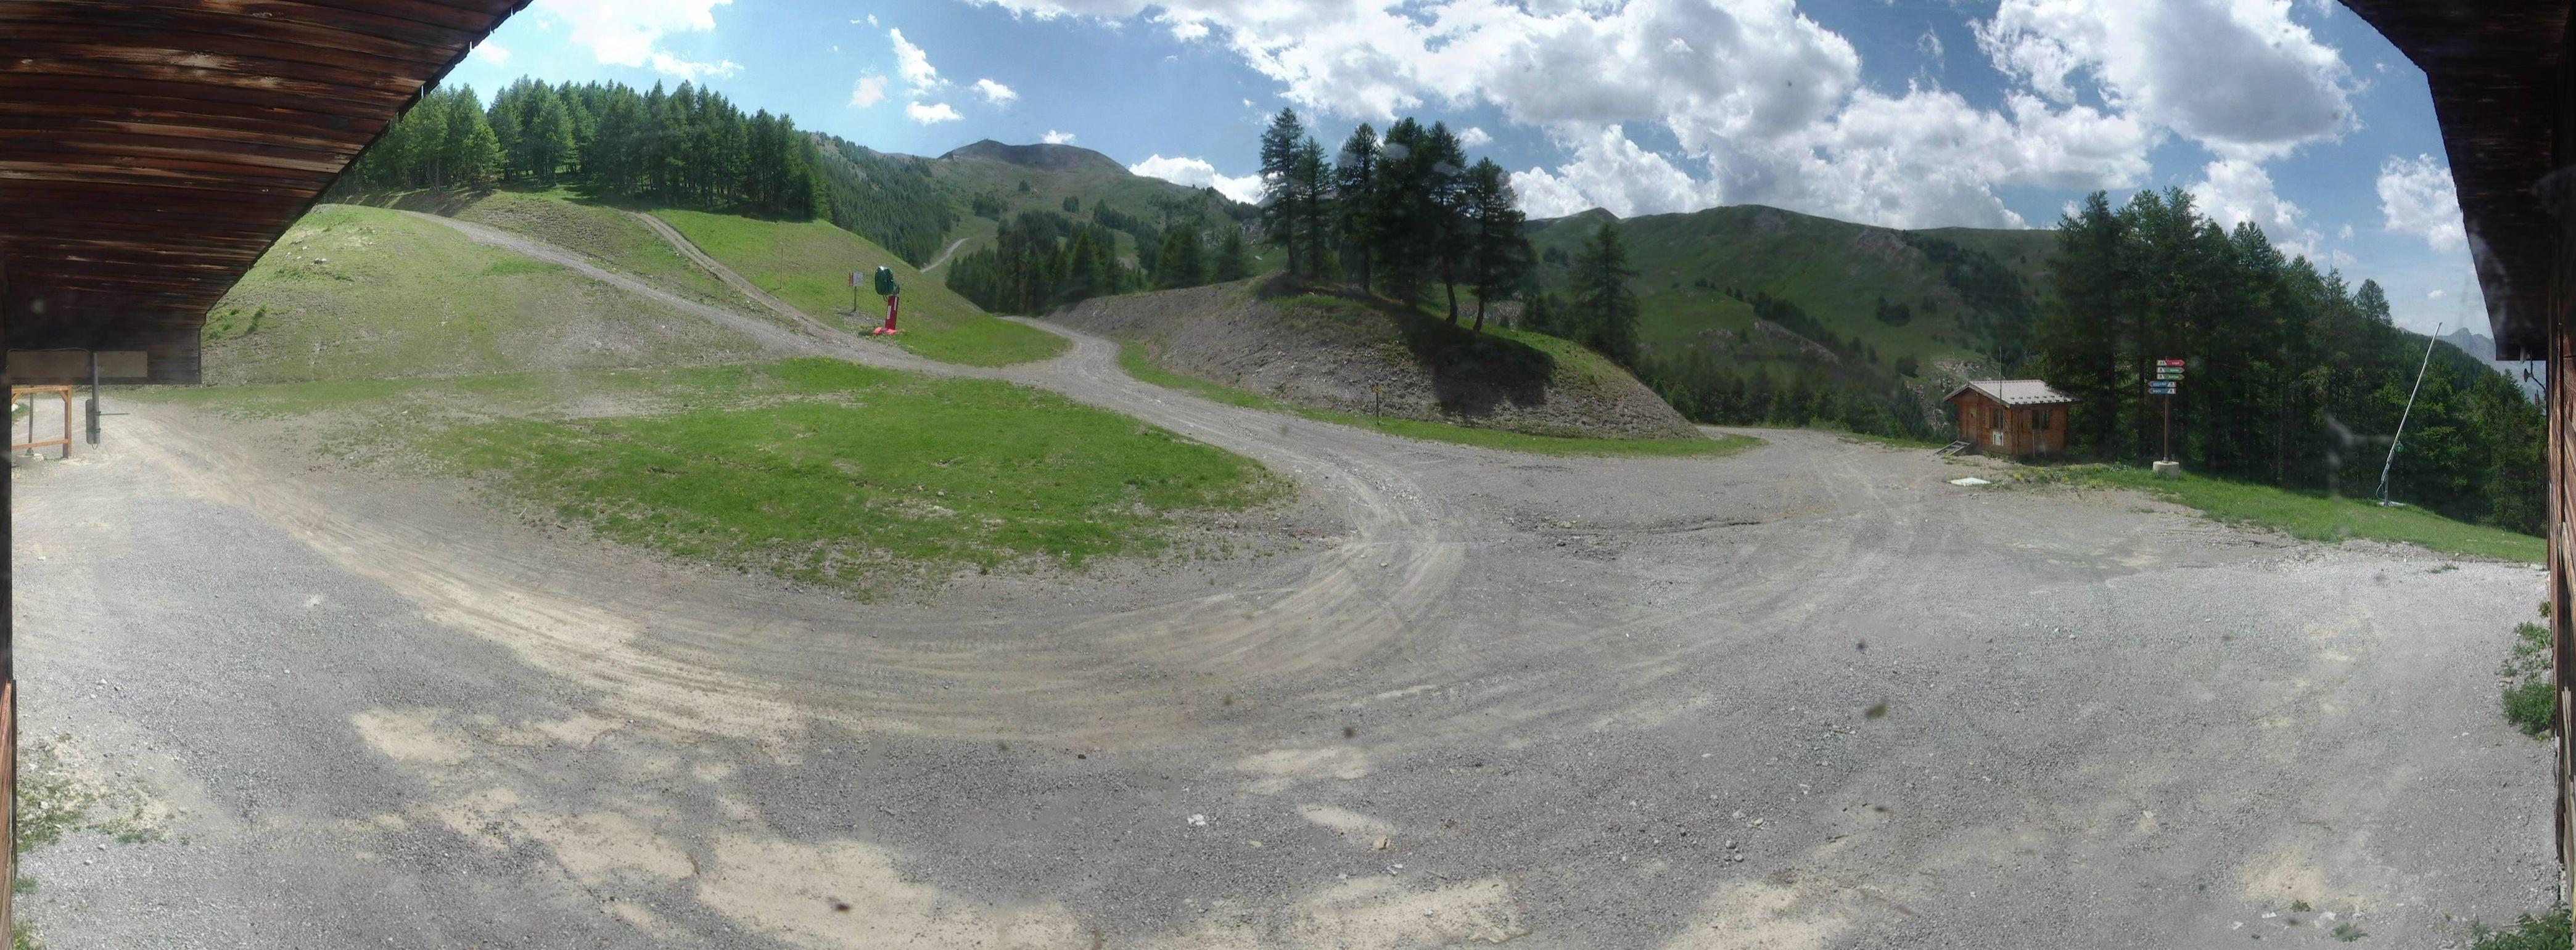 Pra Loup webcam - Le Lac